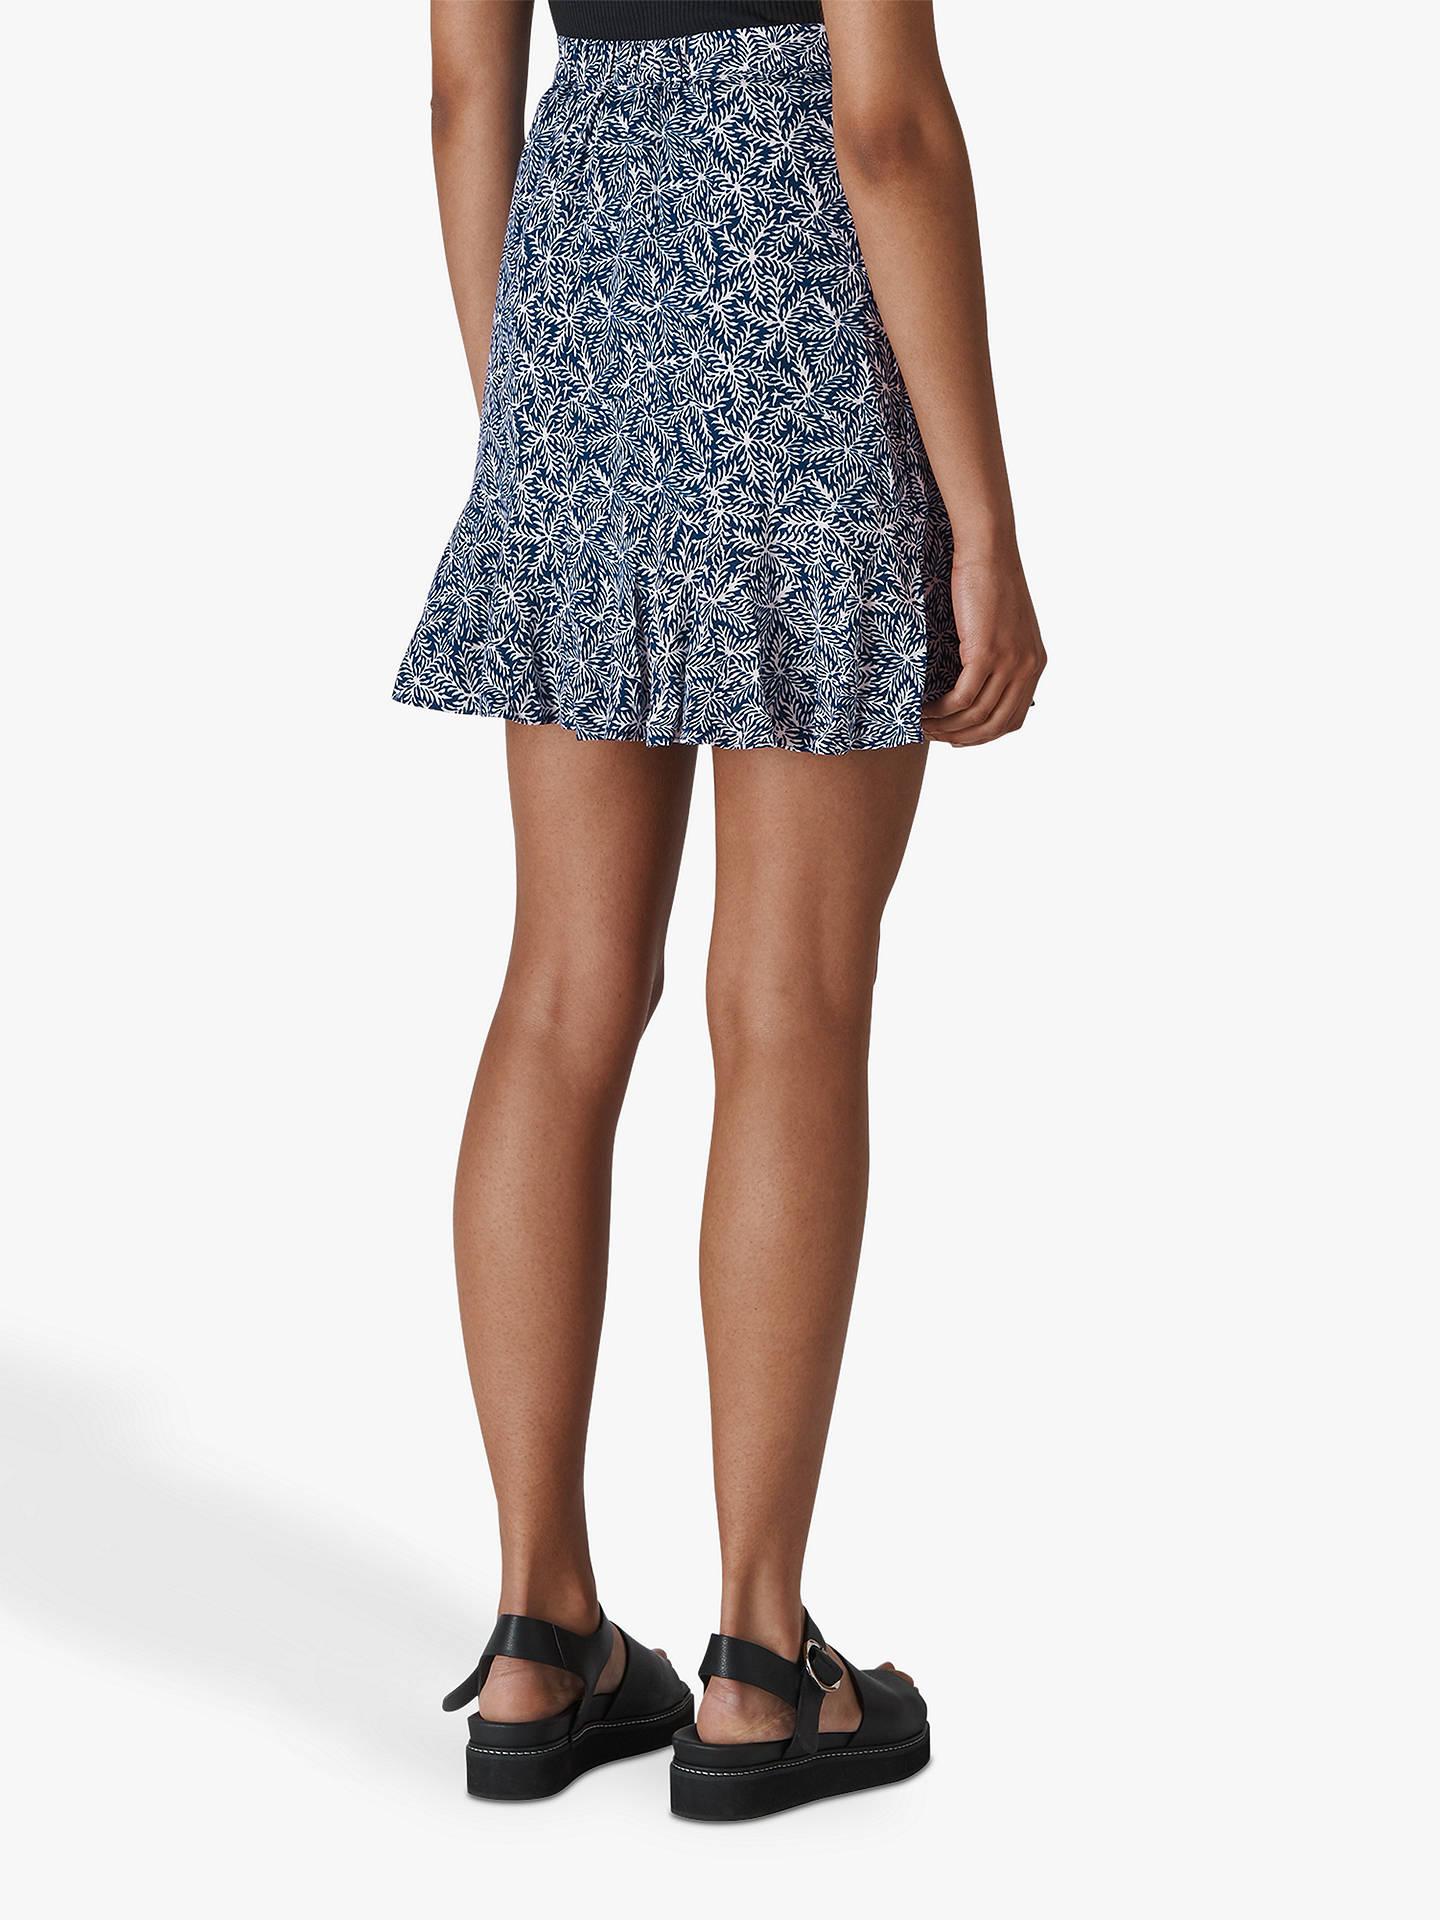 46e6ed17900 Whistles Etched Print Mini Skirt, Navy/Multi